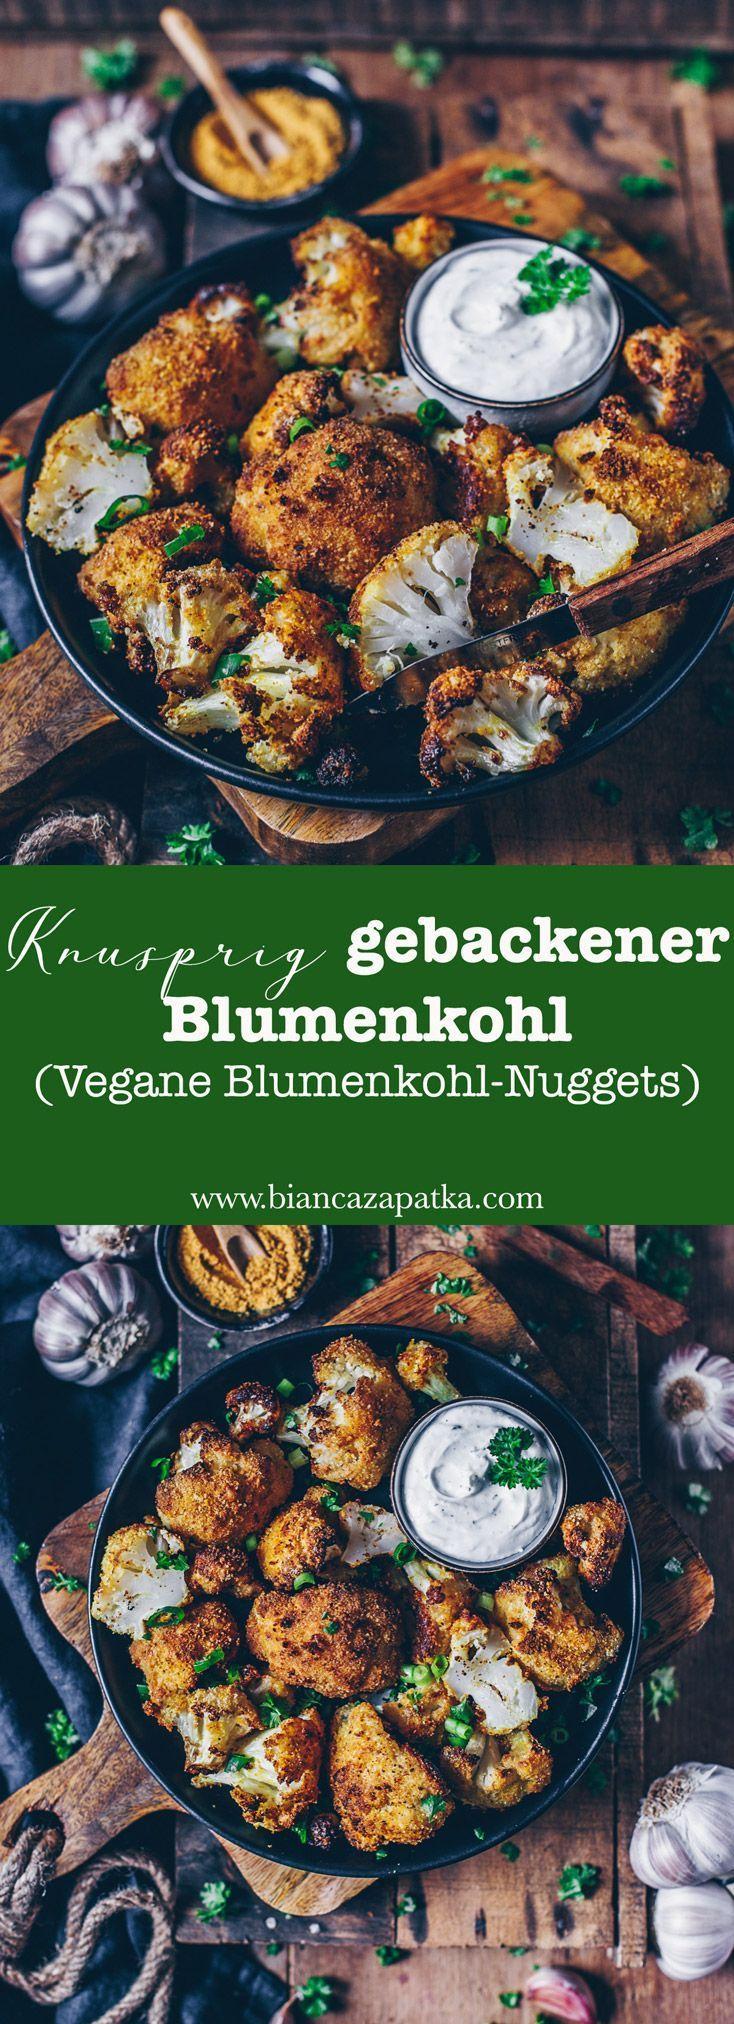 Knusprig gebackener Blumenkohl (vegane Blumenkohl-Nuggets) - Bianca Zapatka | Rezepte